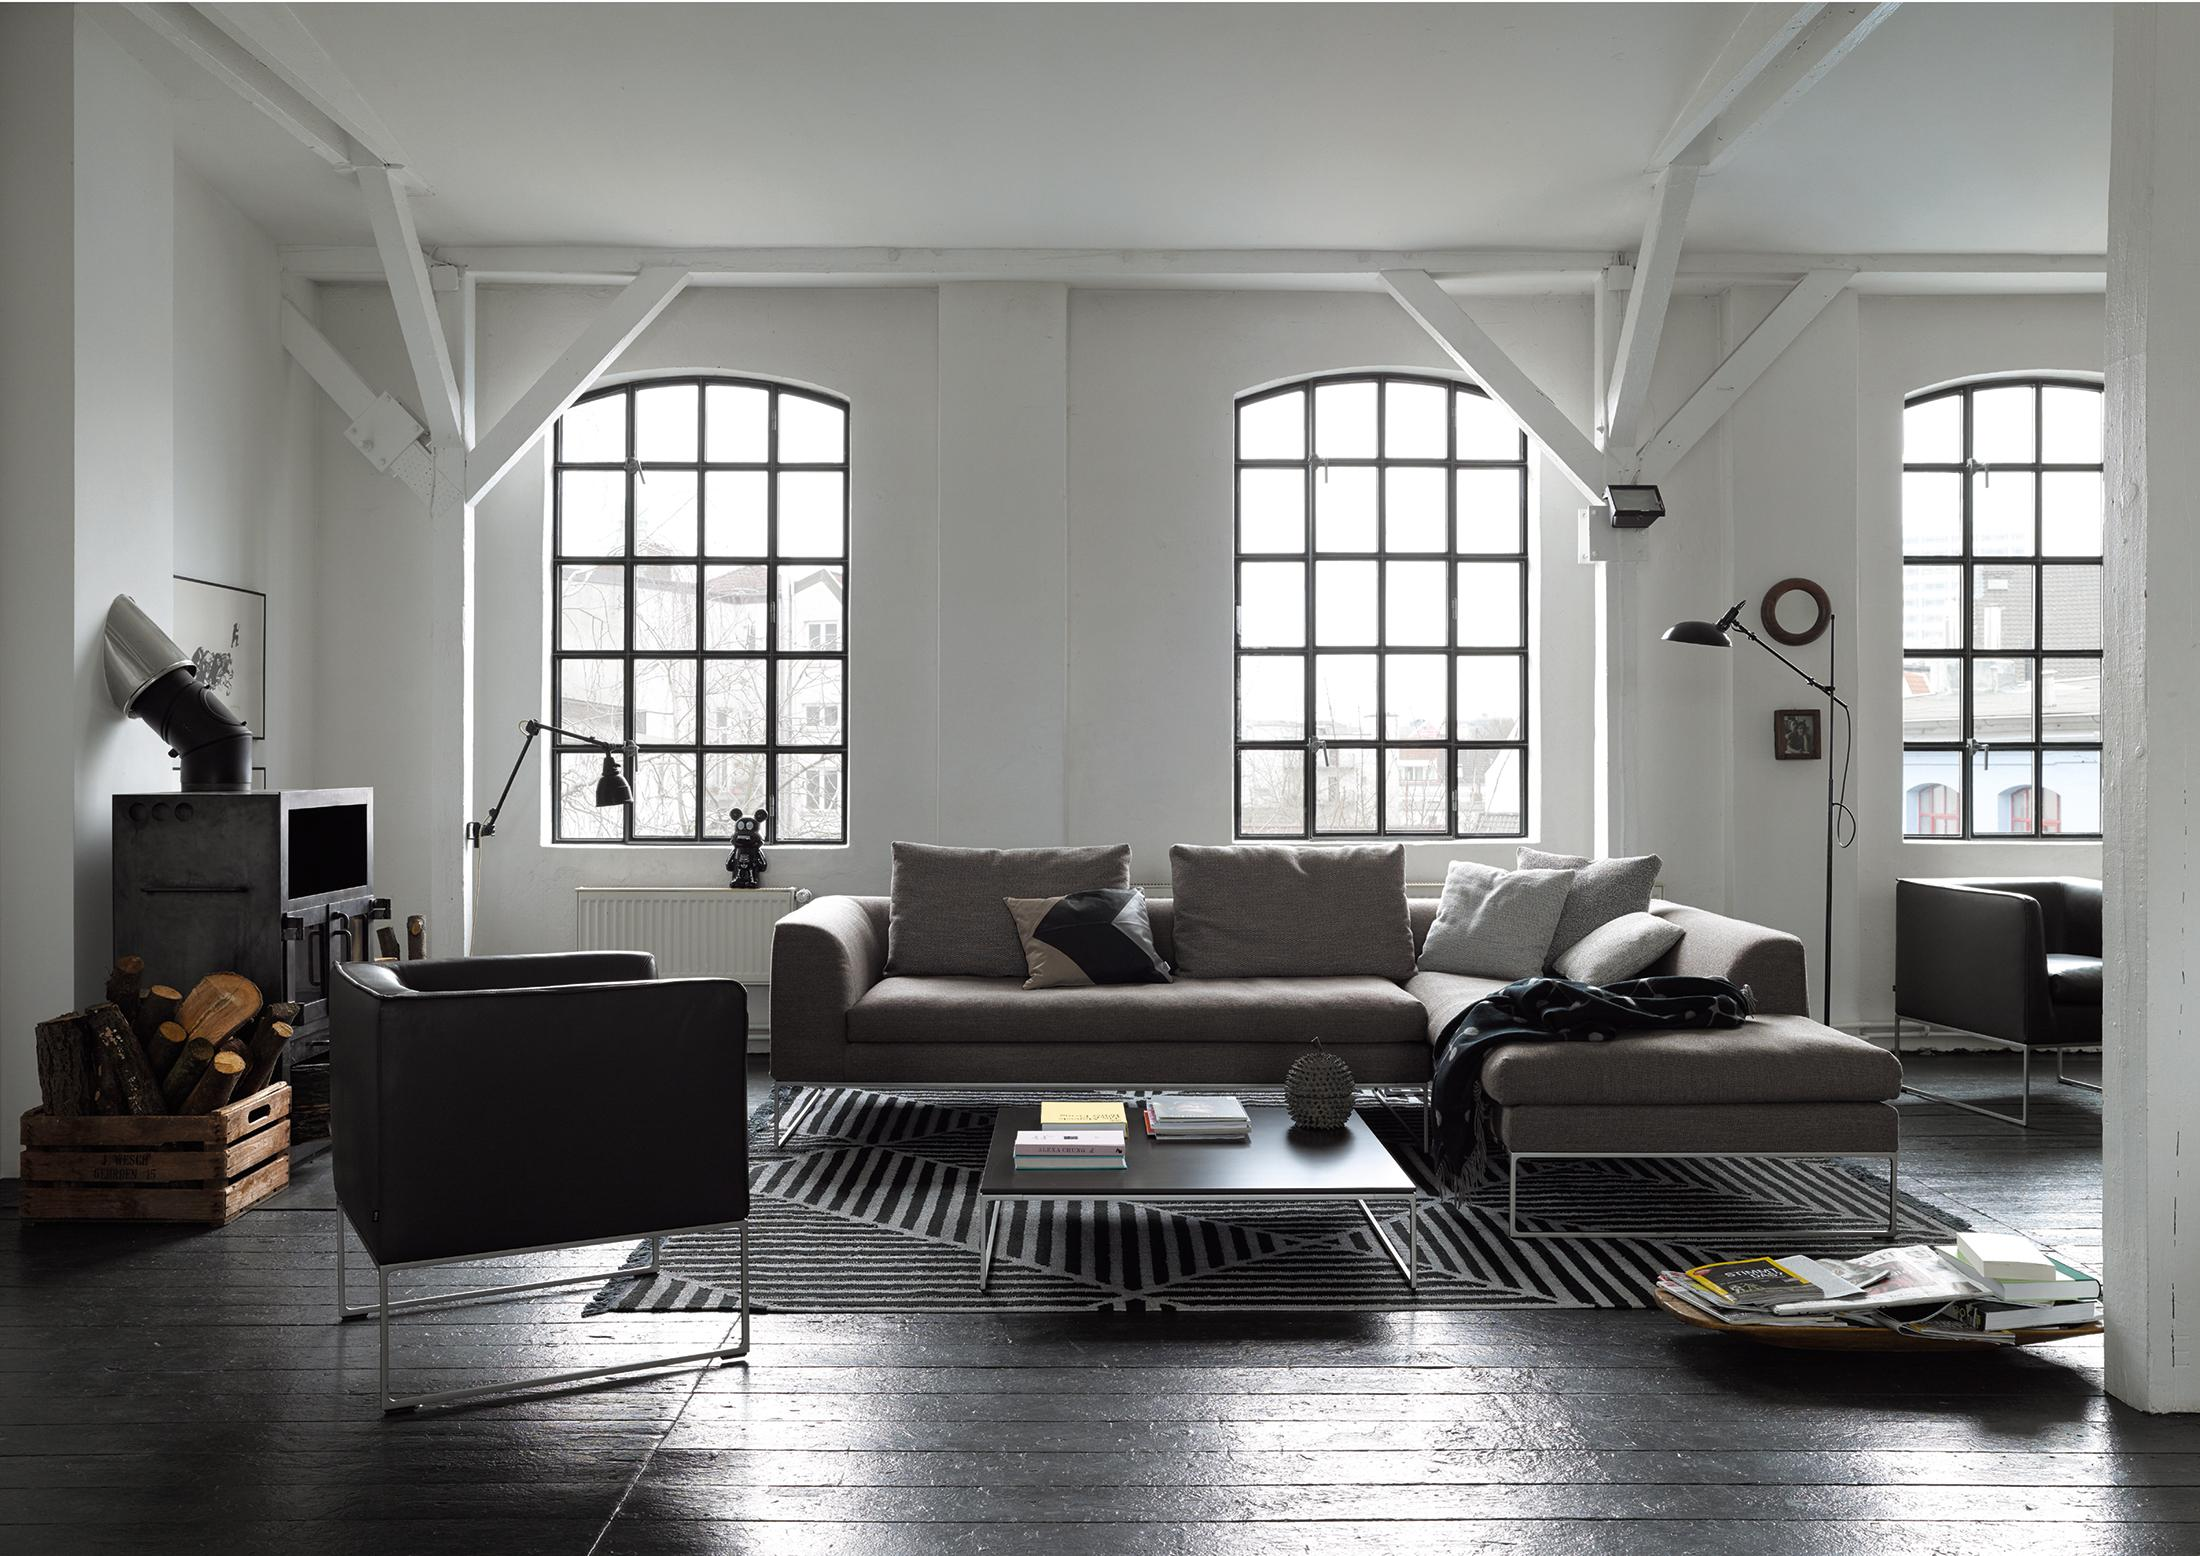 eckkamin bilder ideen couch. Black Bedroom Furniture Sets. Home Design Ideas